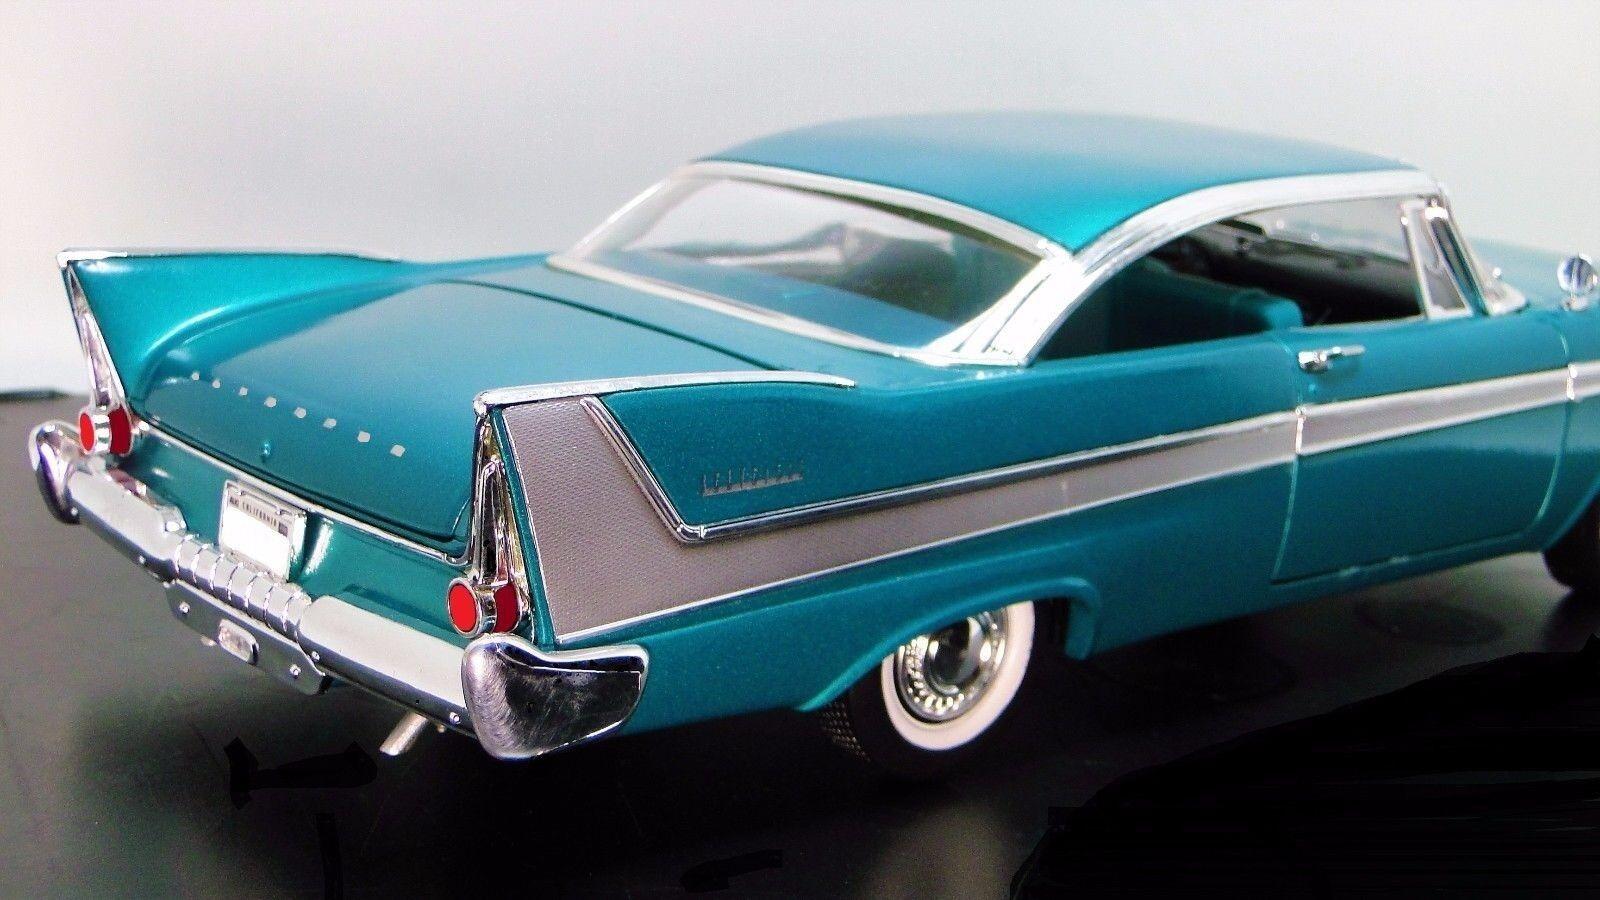 1 Dodge Plymouth Chrysler 1957 Vintage Car 18 Classic 24 Concept 12 300C 43